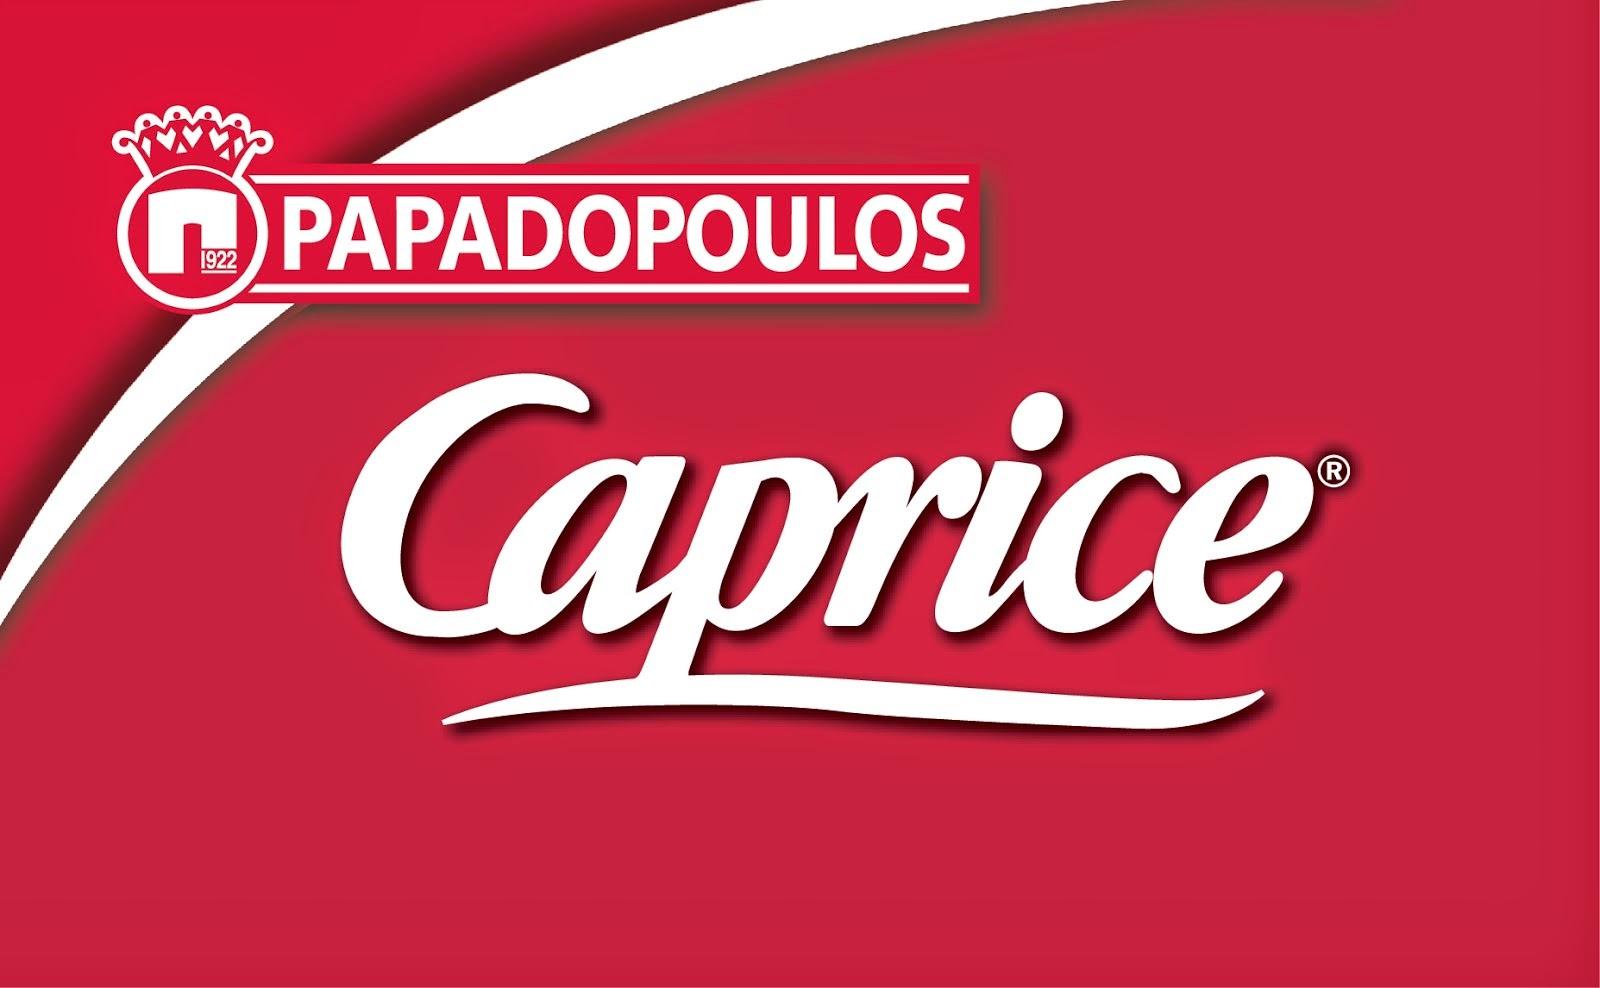 Papadopoulous